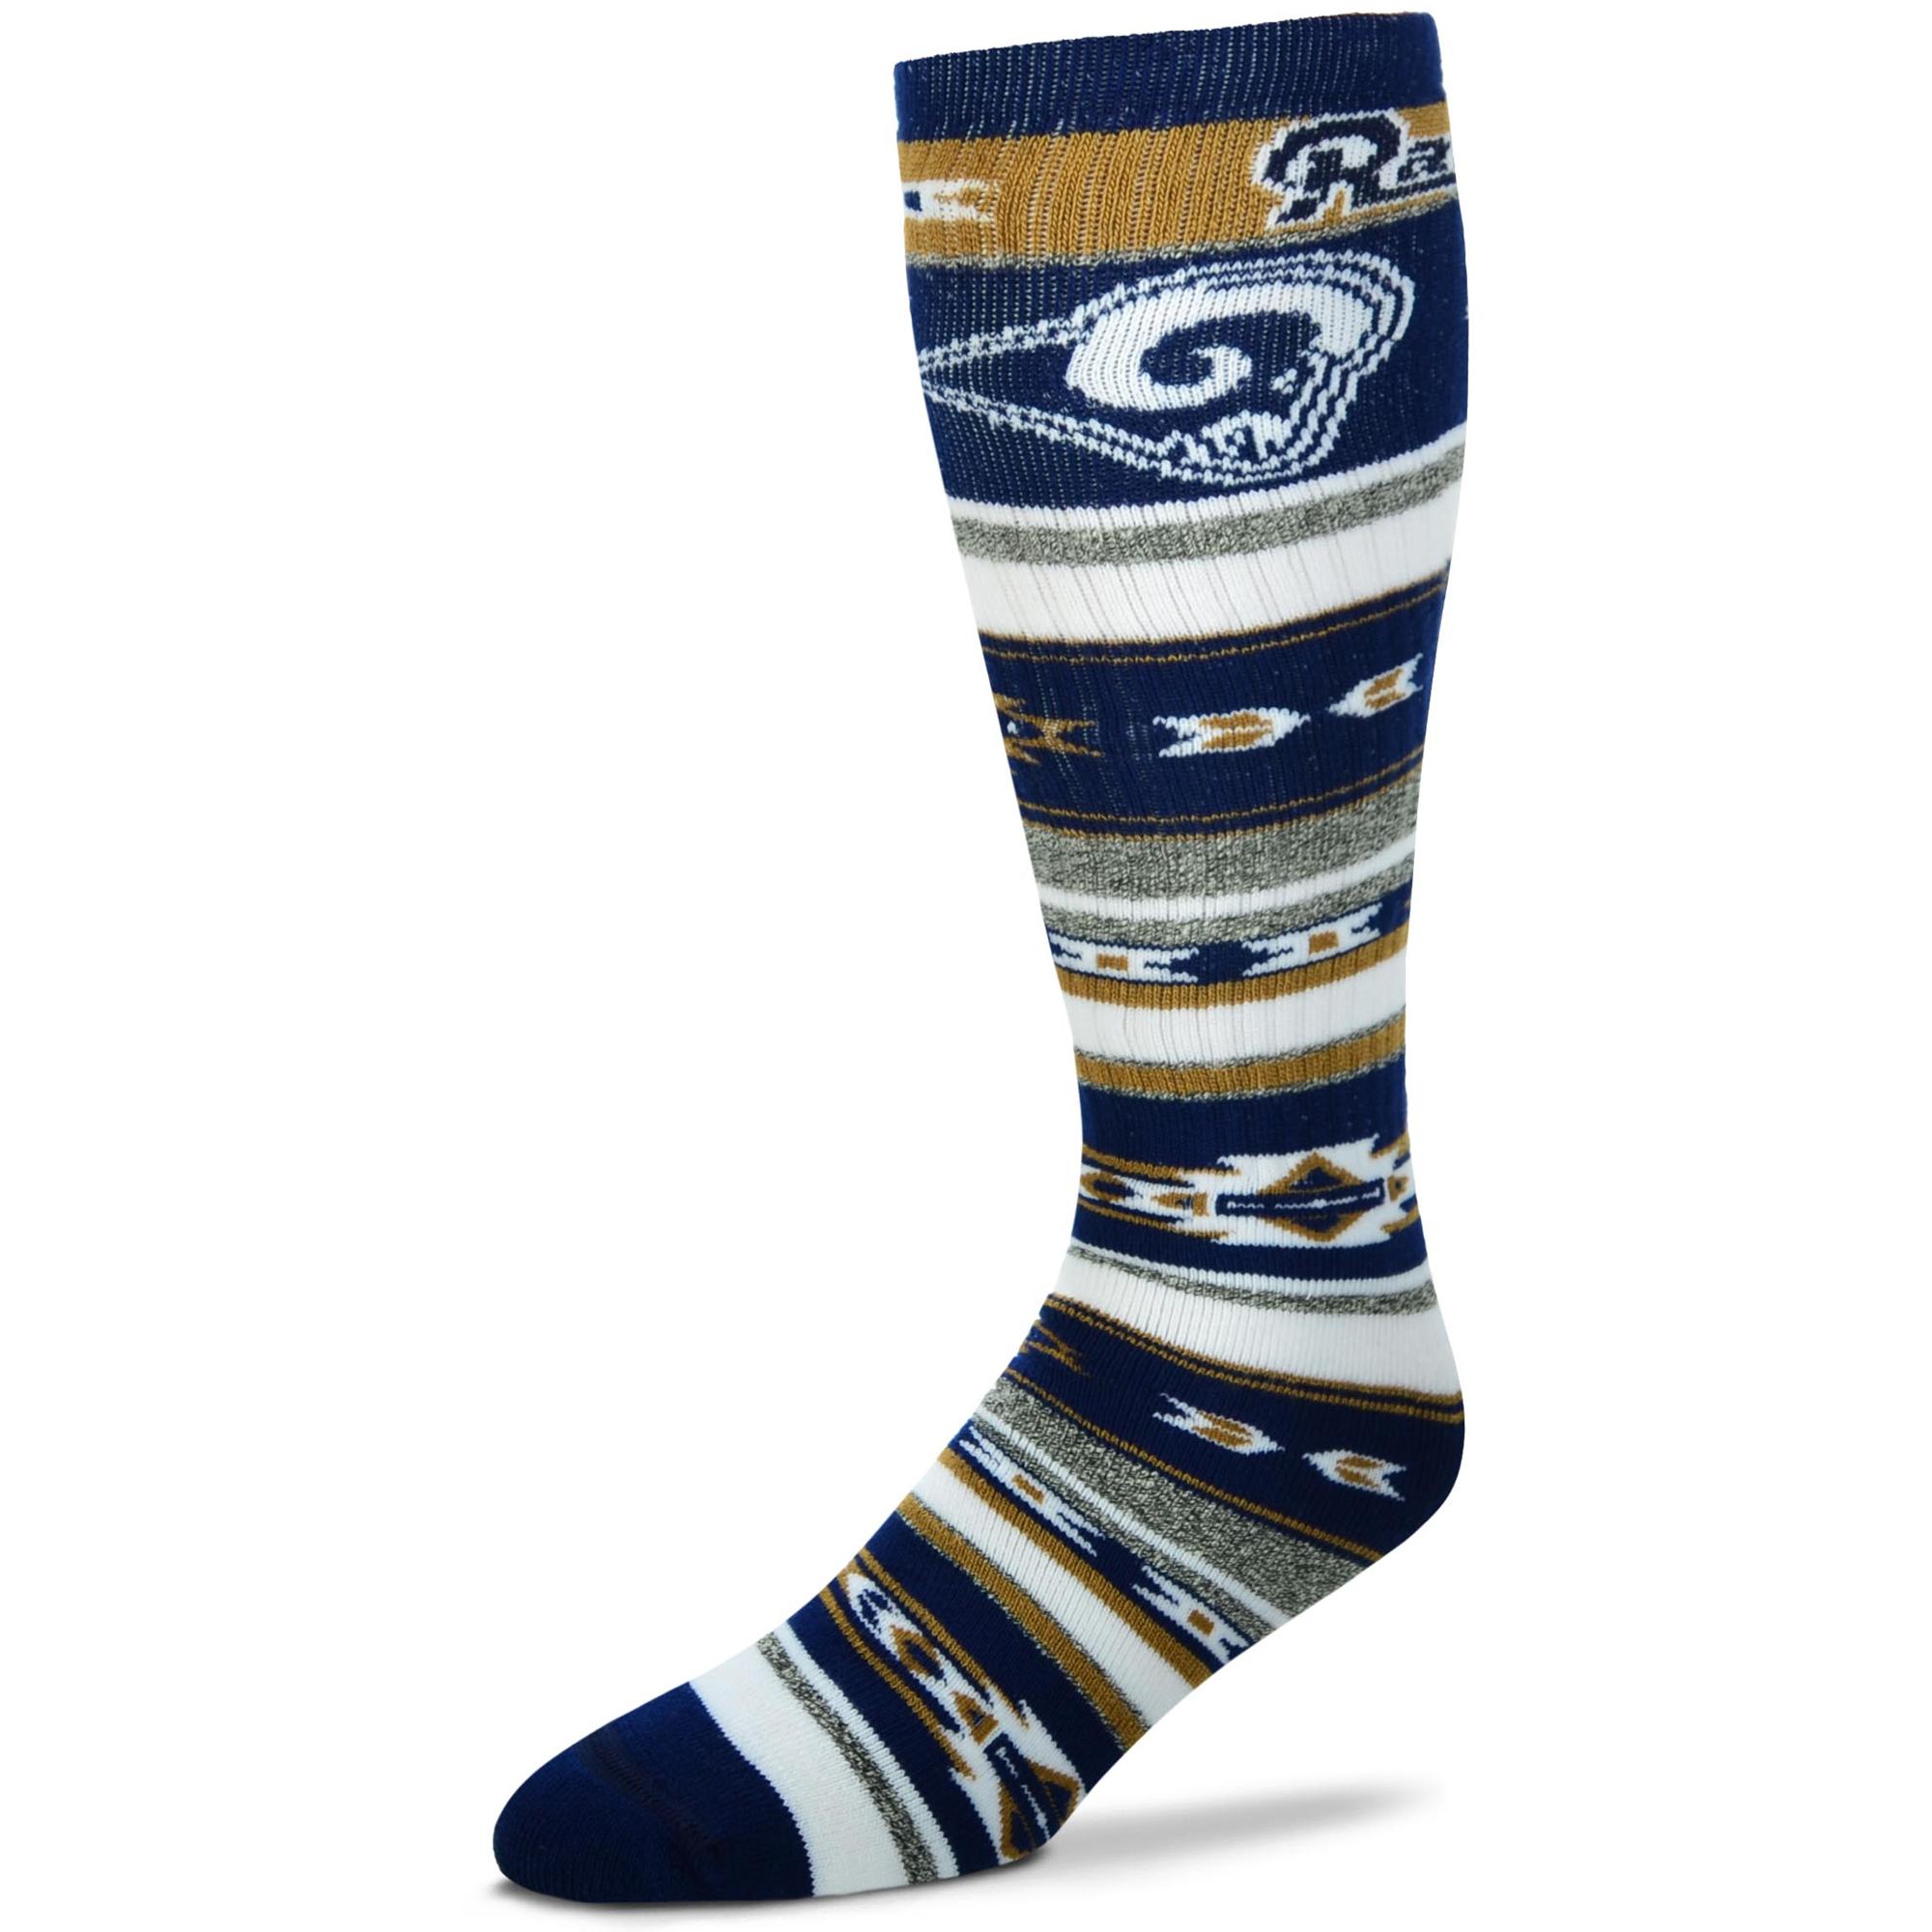 Los Angeles Rams For Bare Feet Women's Tailgater Crew Sock - M